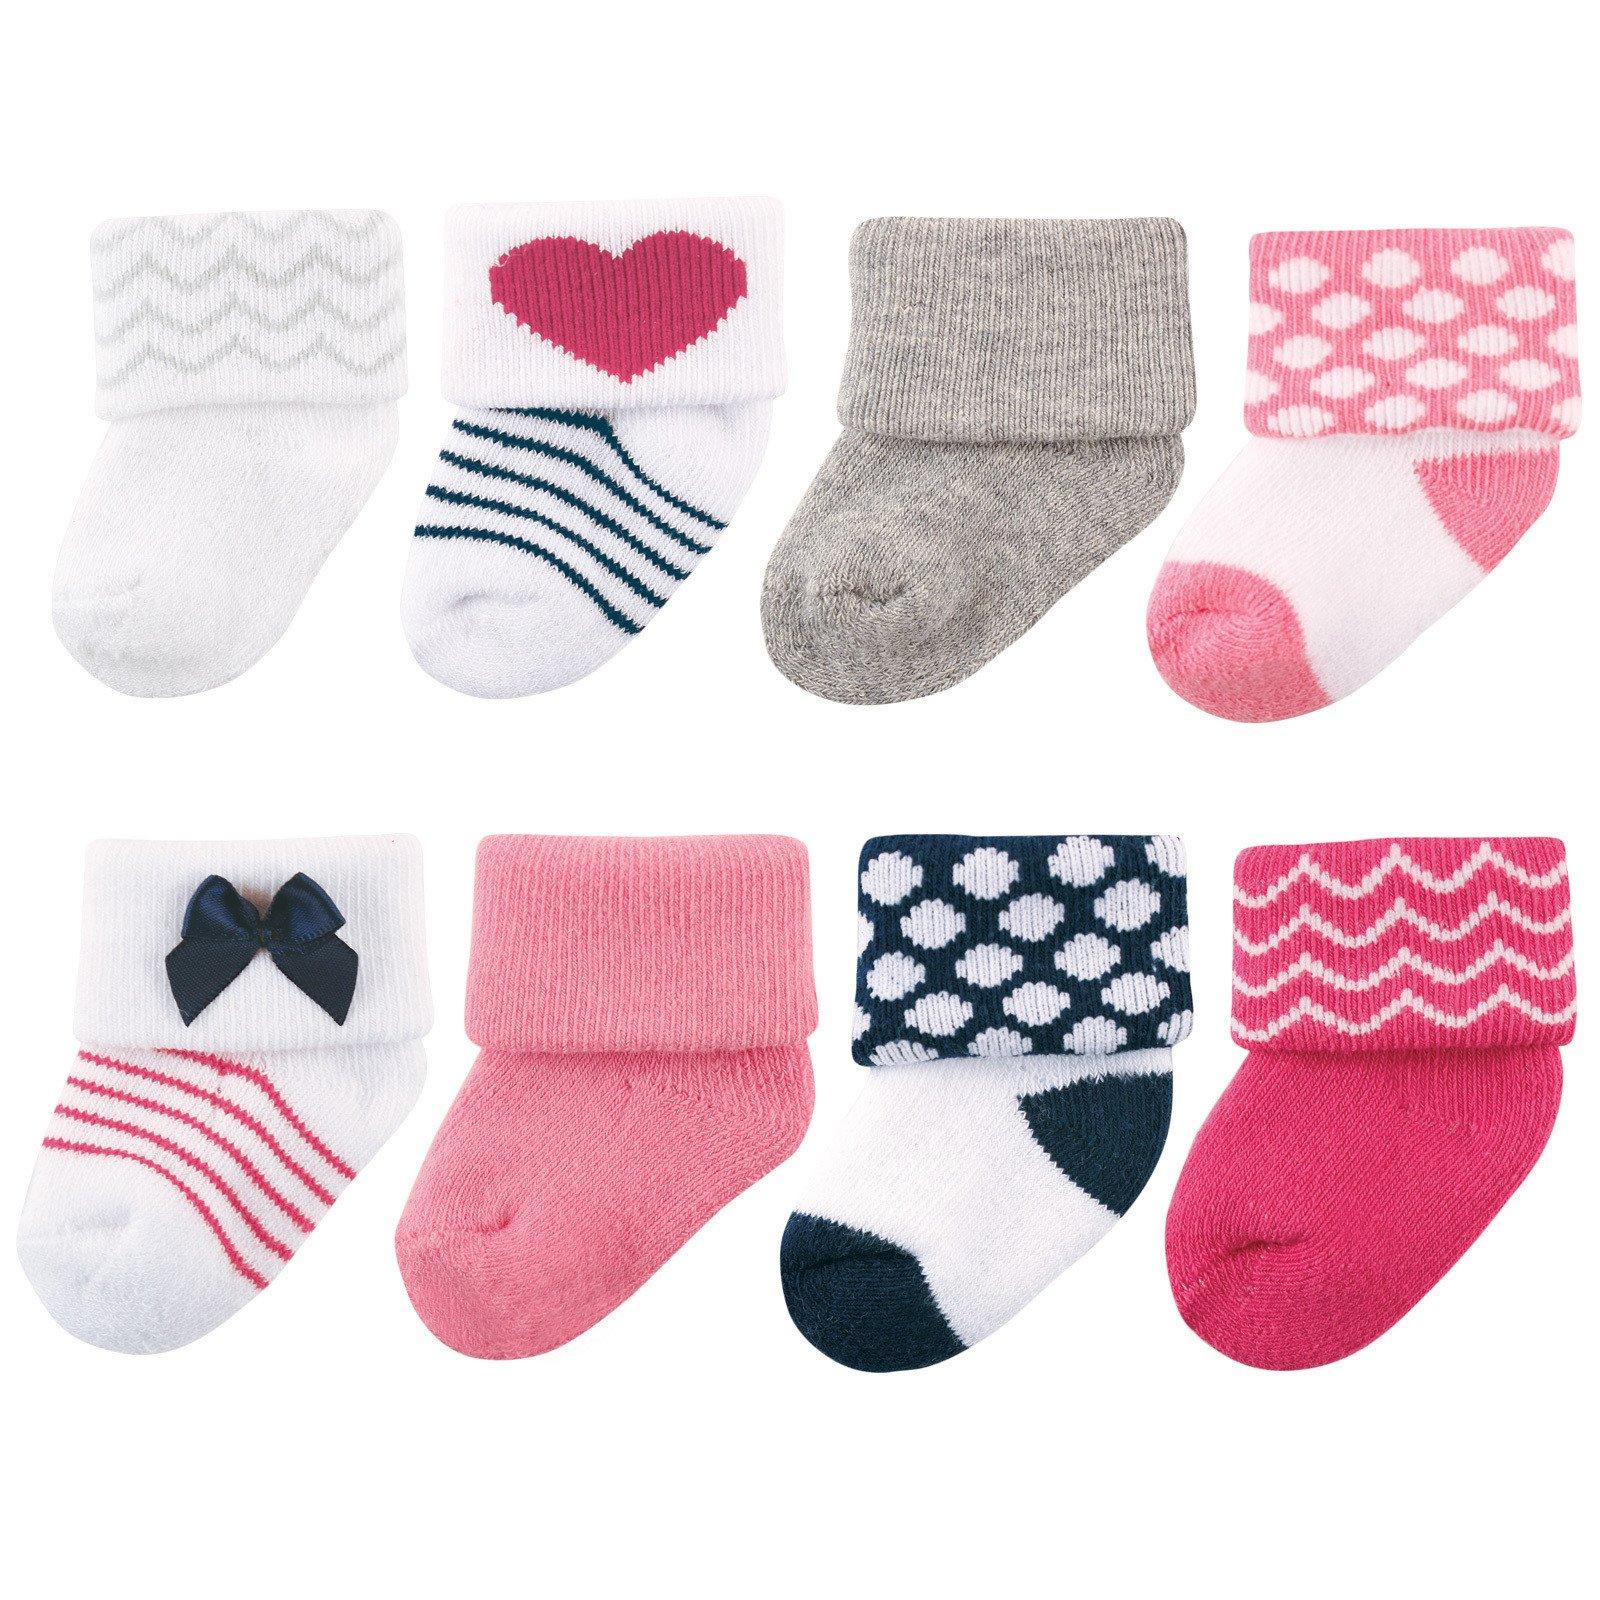 Luvable Friends Unisex 8 Pack Newborn Socks, Dark